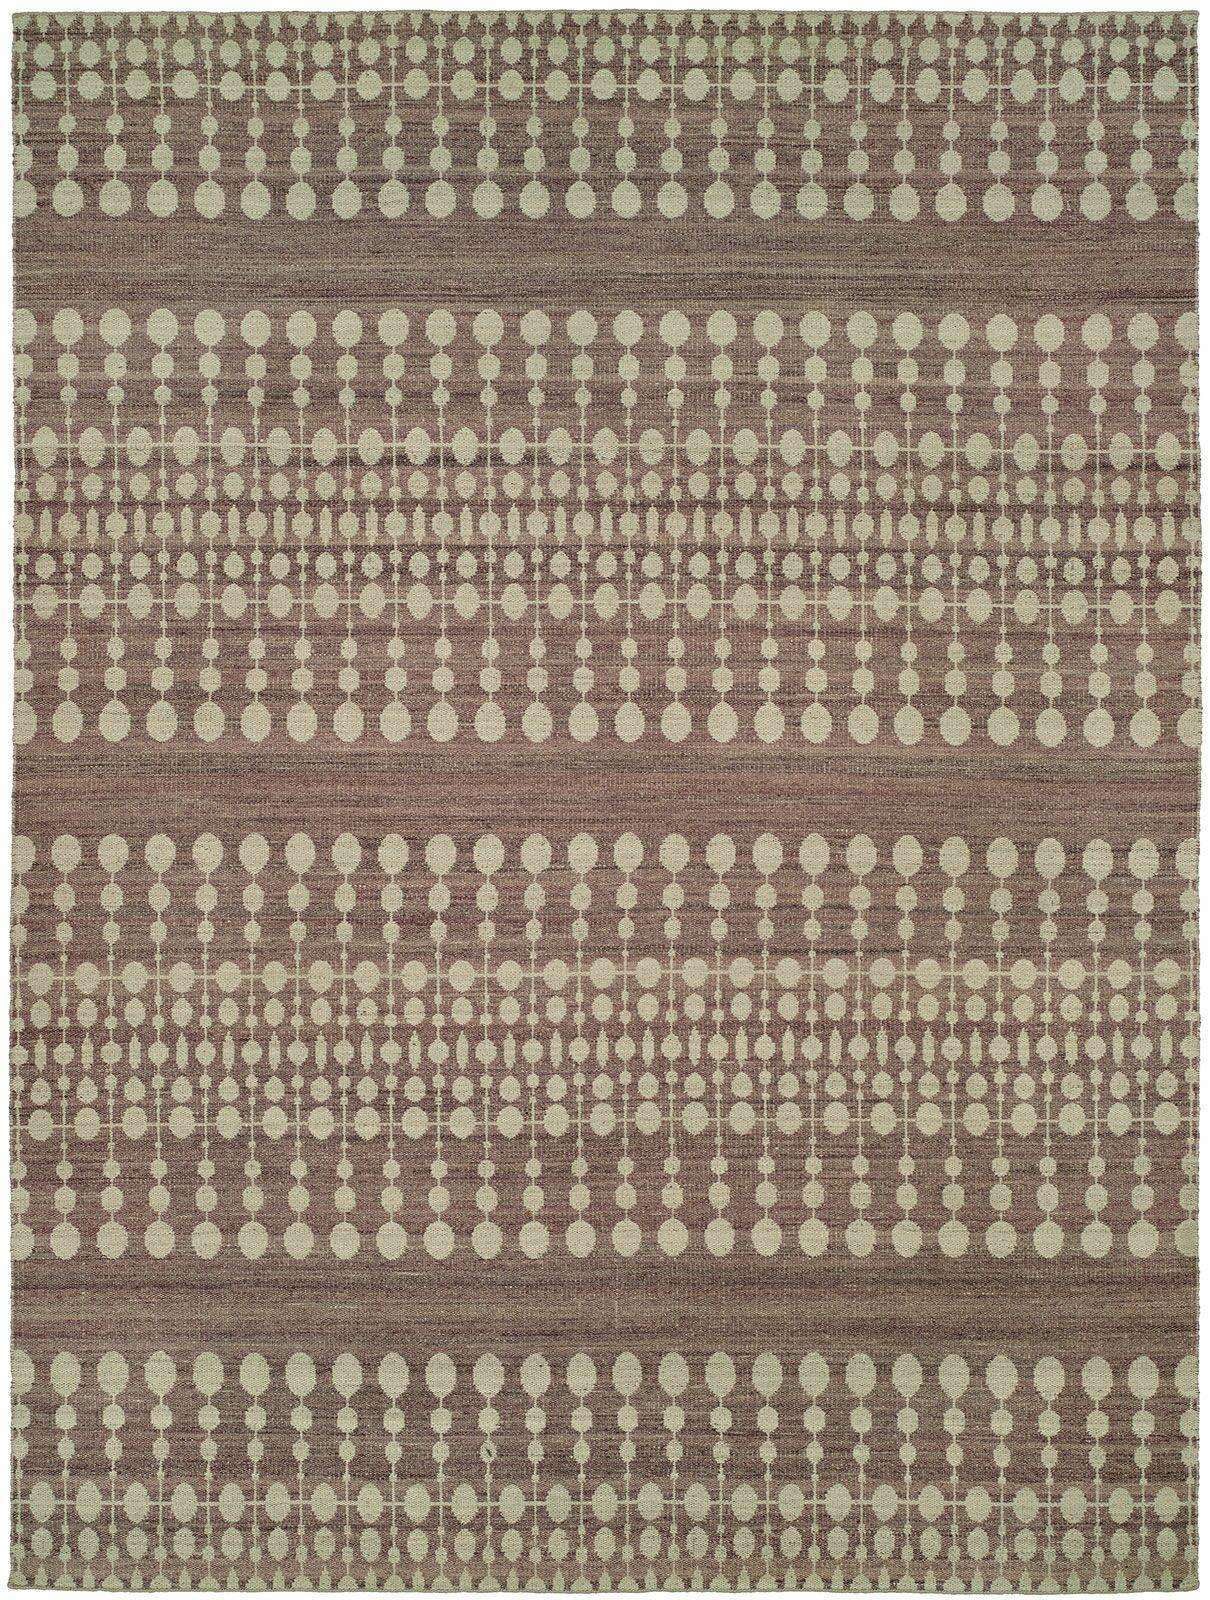 Omaha Handmade Ivory/Lilac Area Rug Rug Size: 5' x 8'